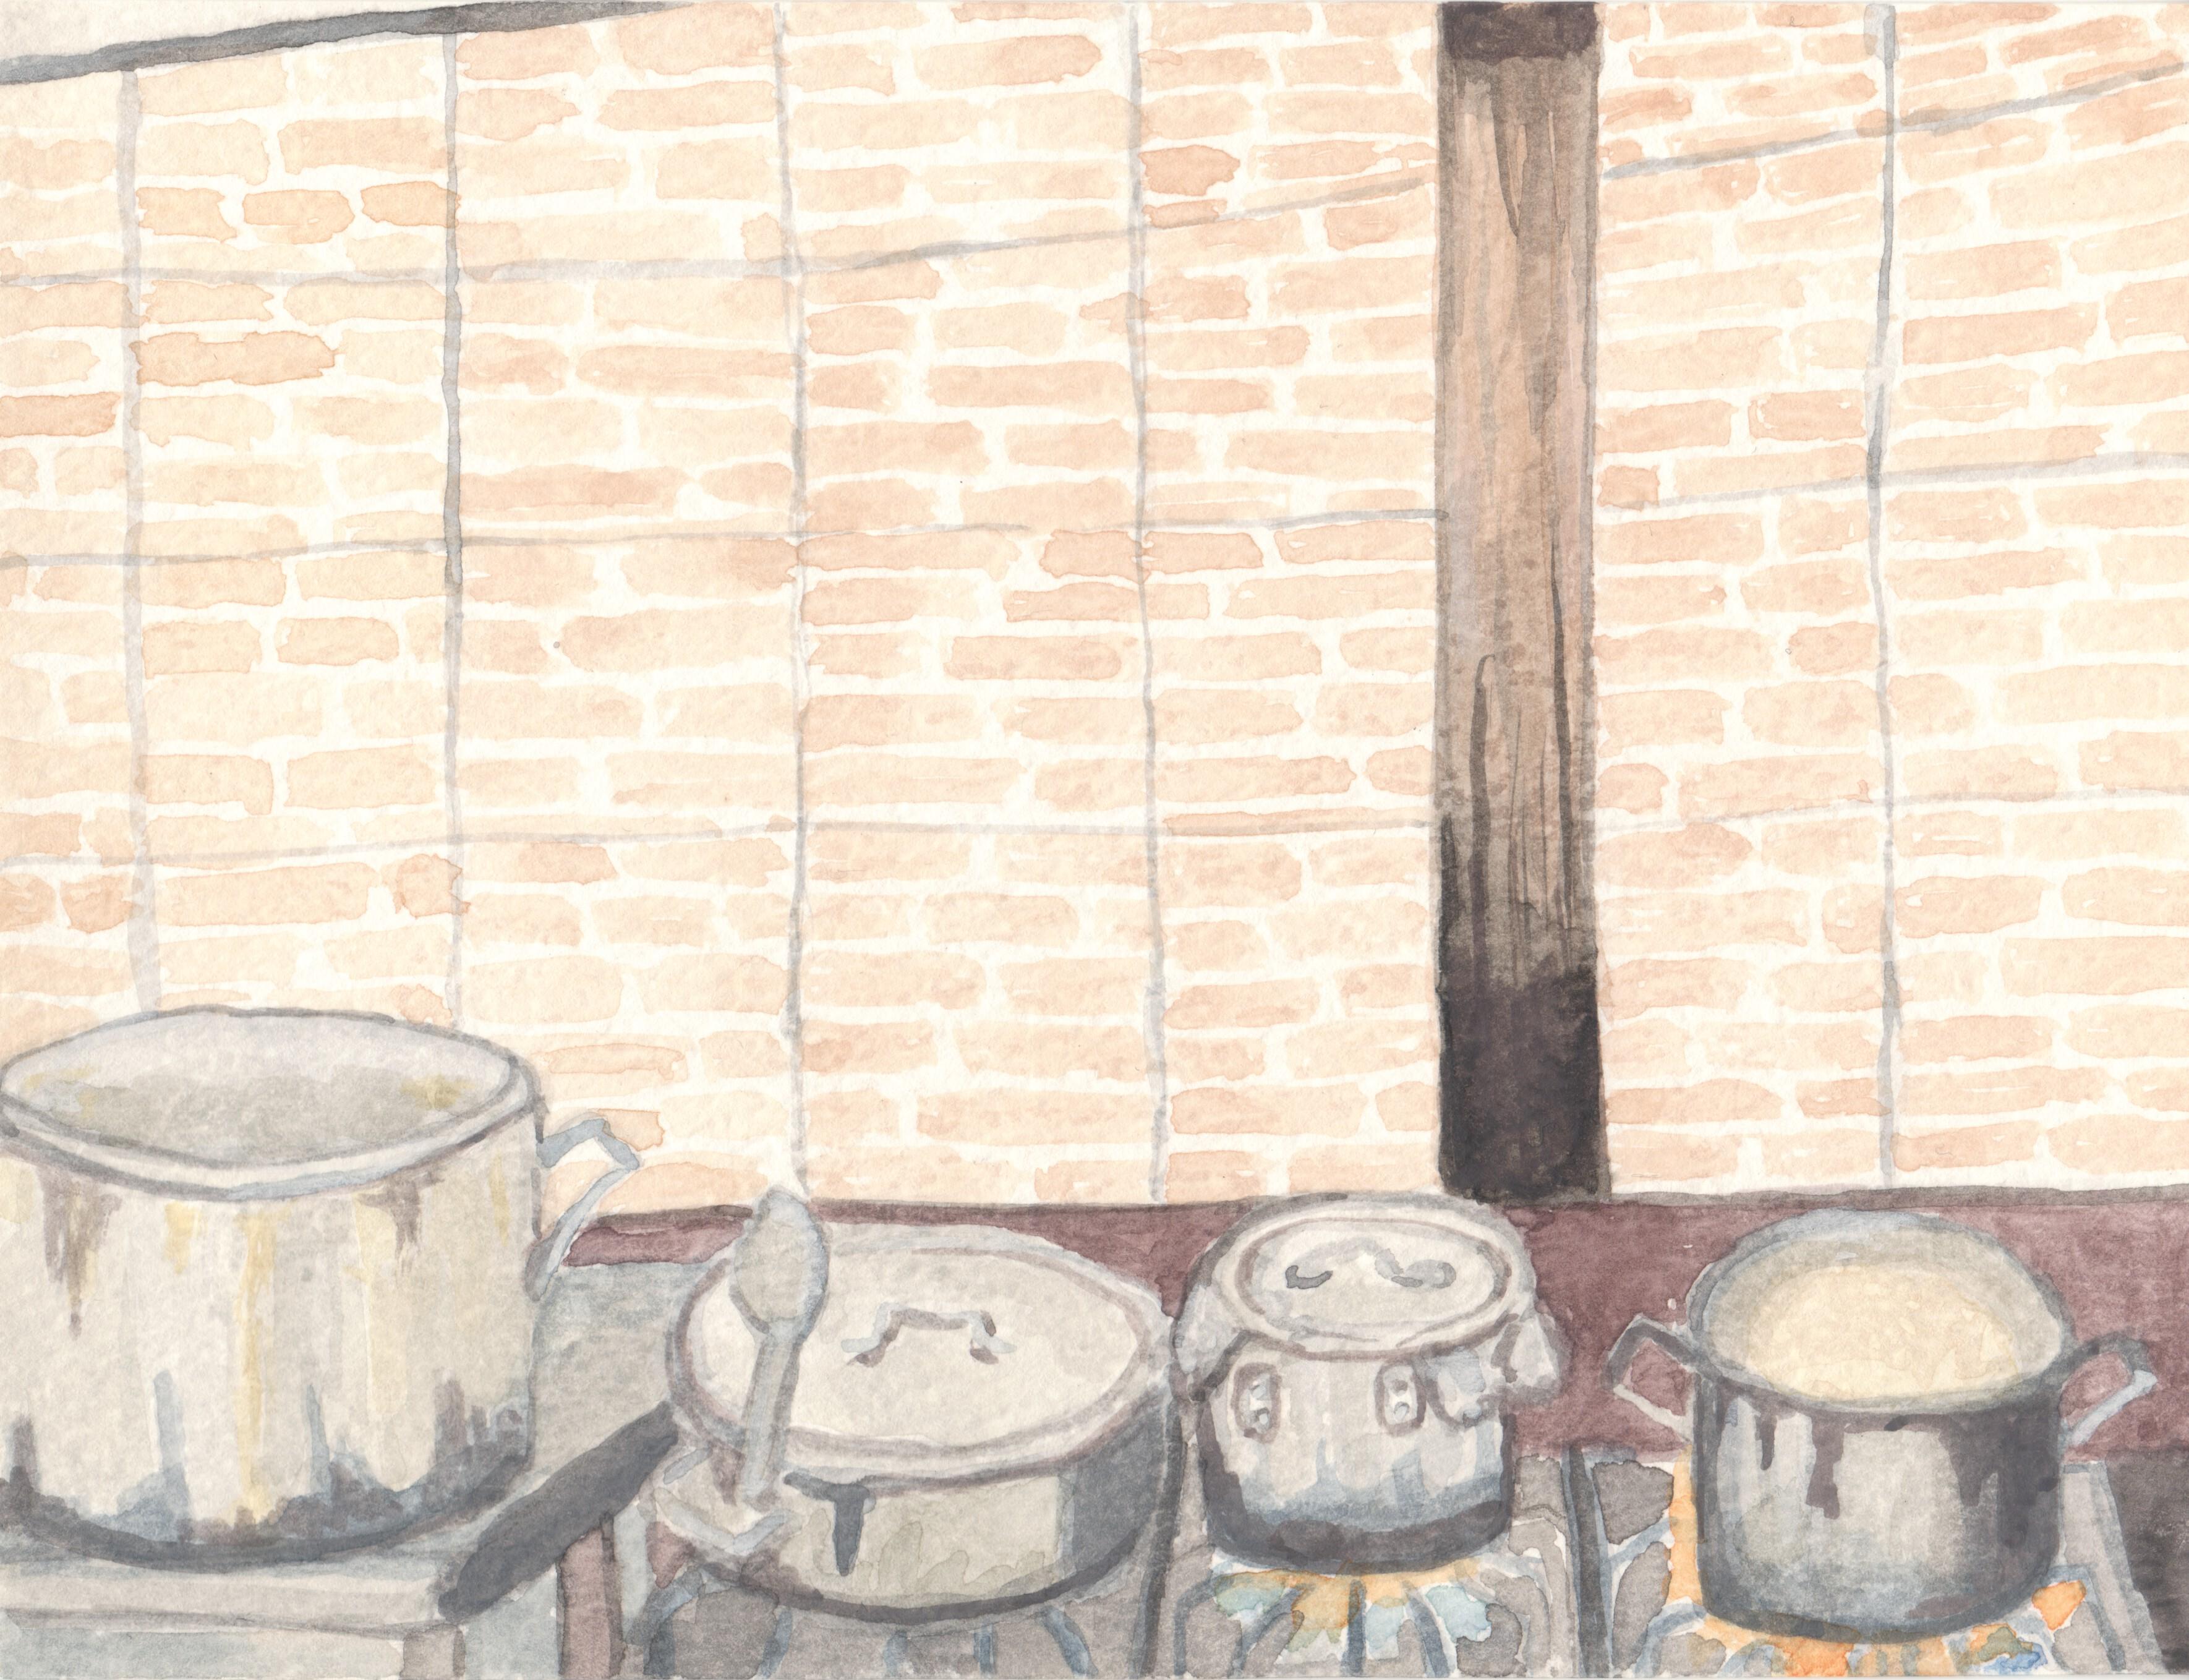 Delroy's Pots, 2015